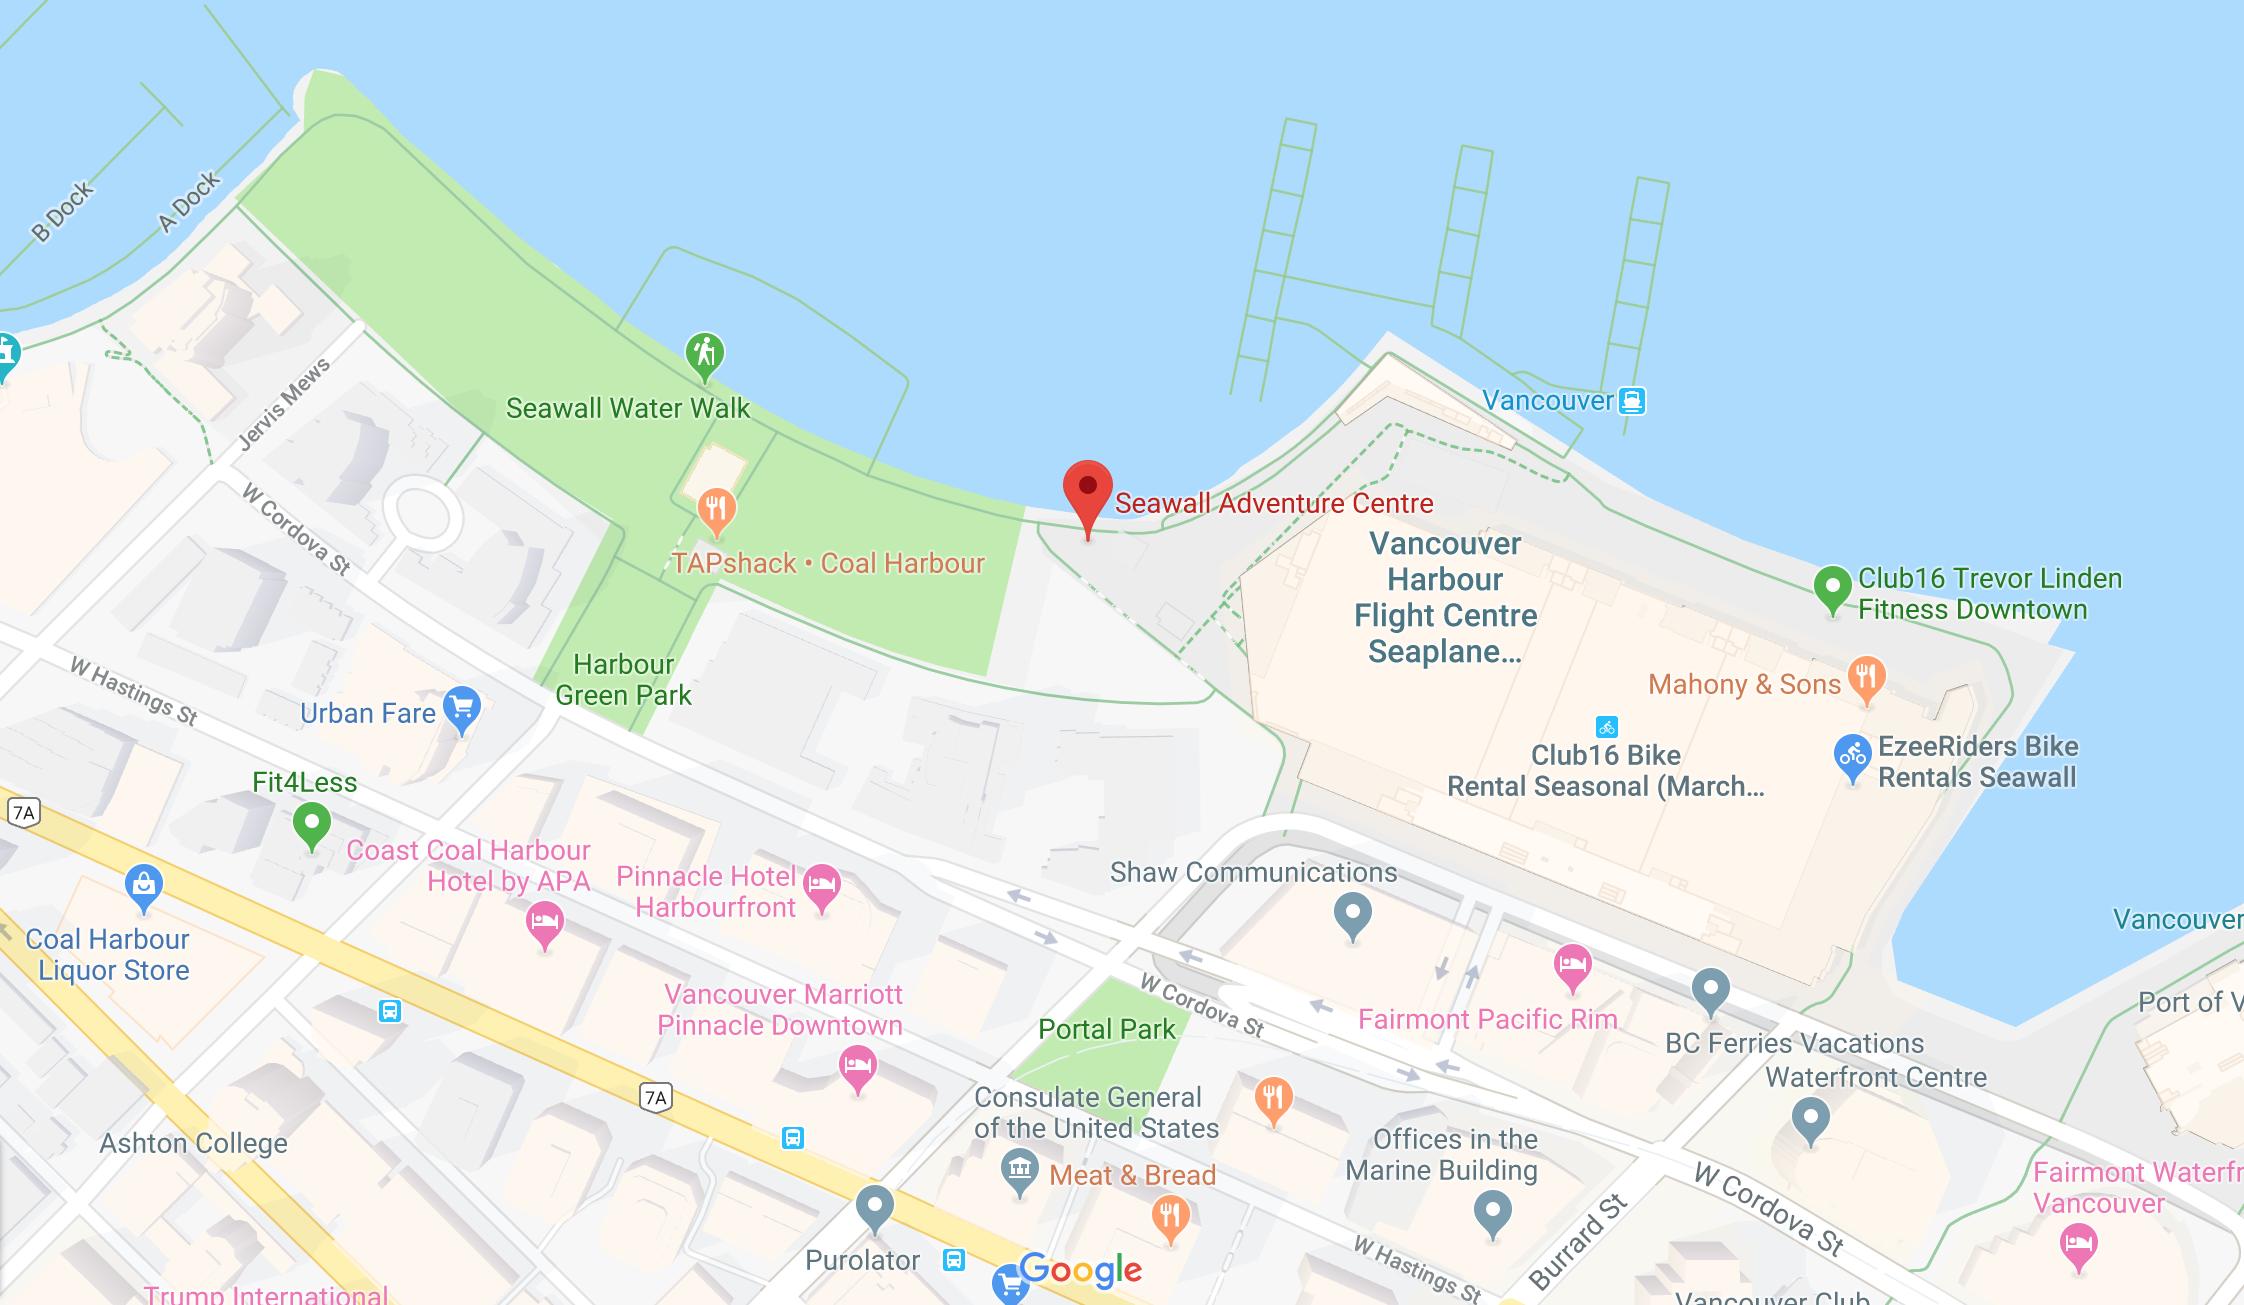 Seawall Adventure Centre Location